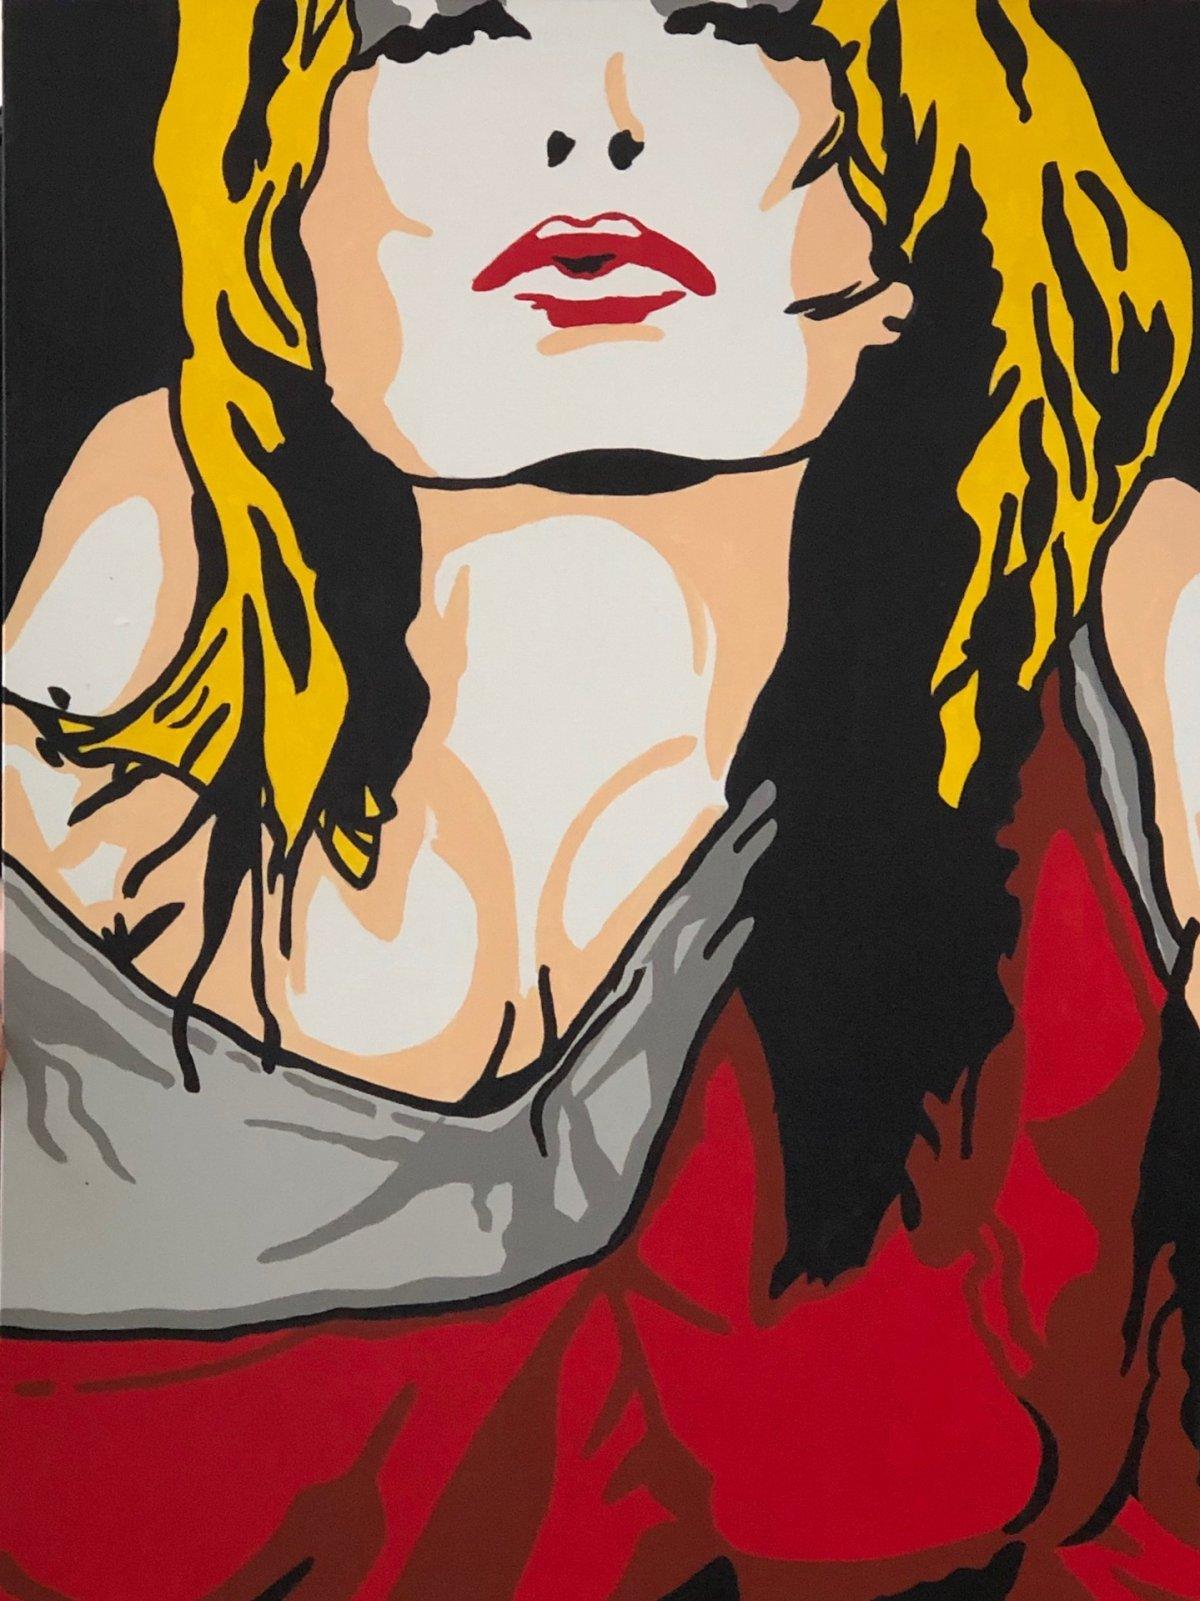 kiss-kiss-steffen-kindt-popart-streetart-urbanart-galerie-hamburg-popstreetshop